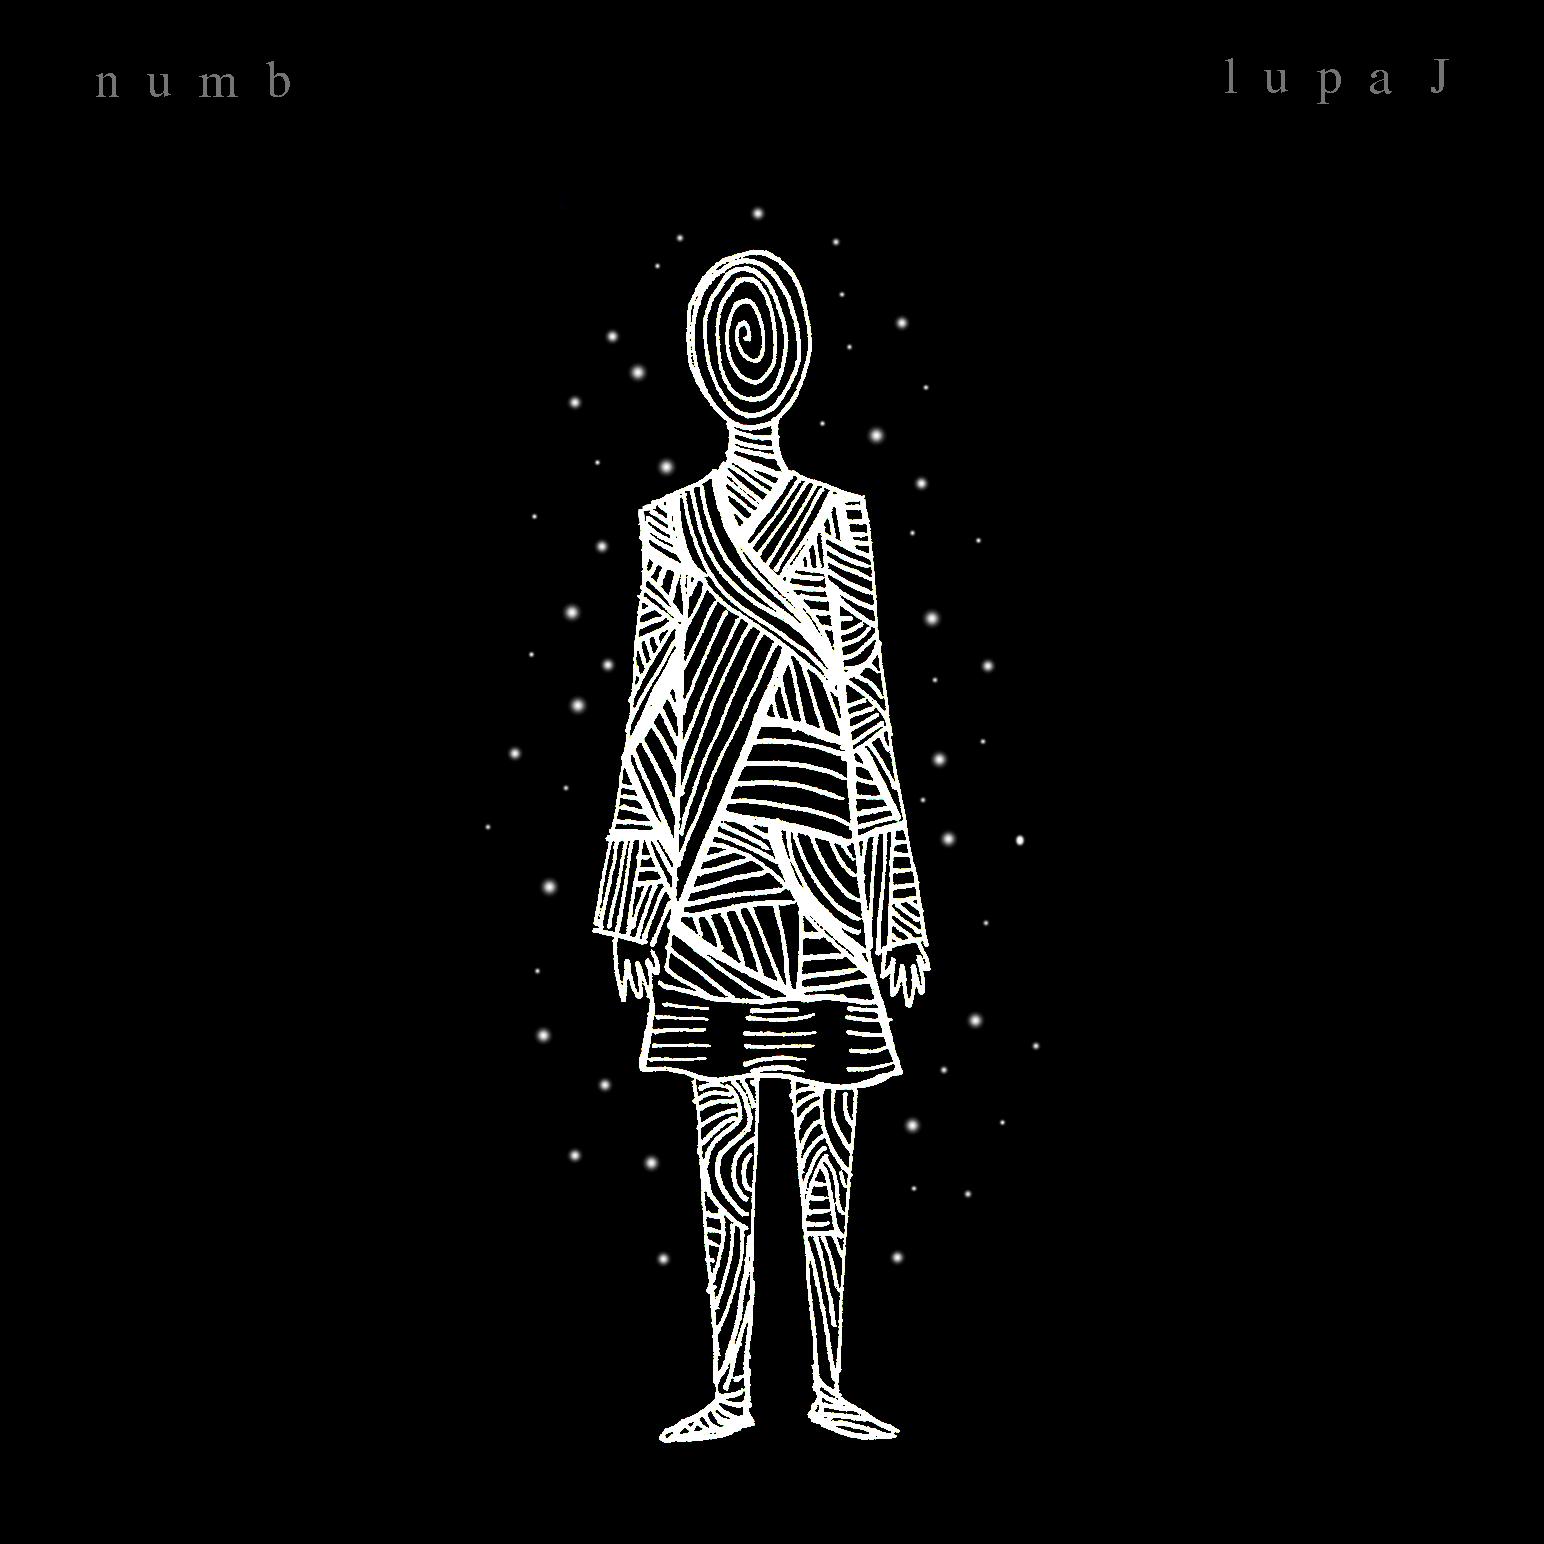 numb album art 2 writing copy.jpg